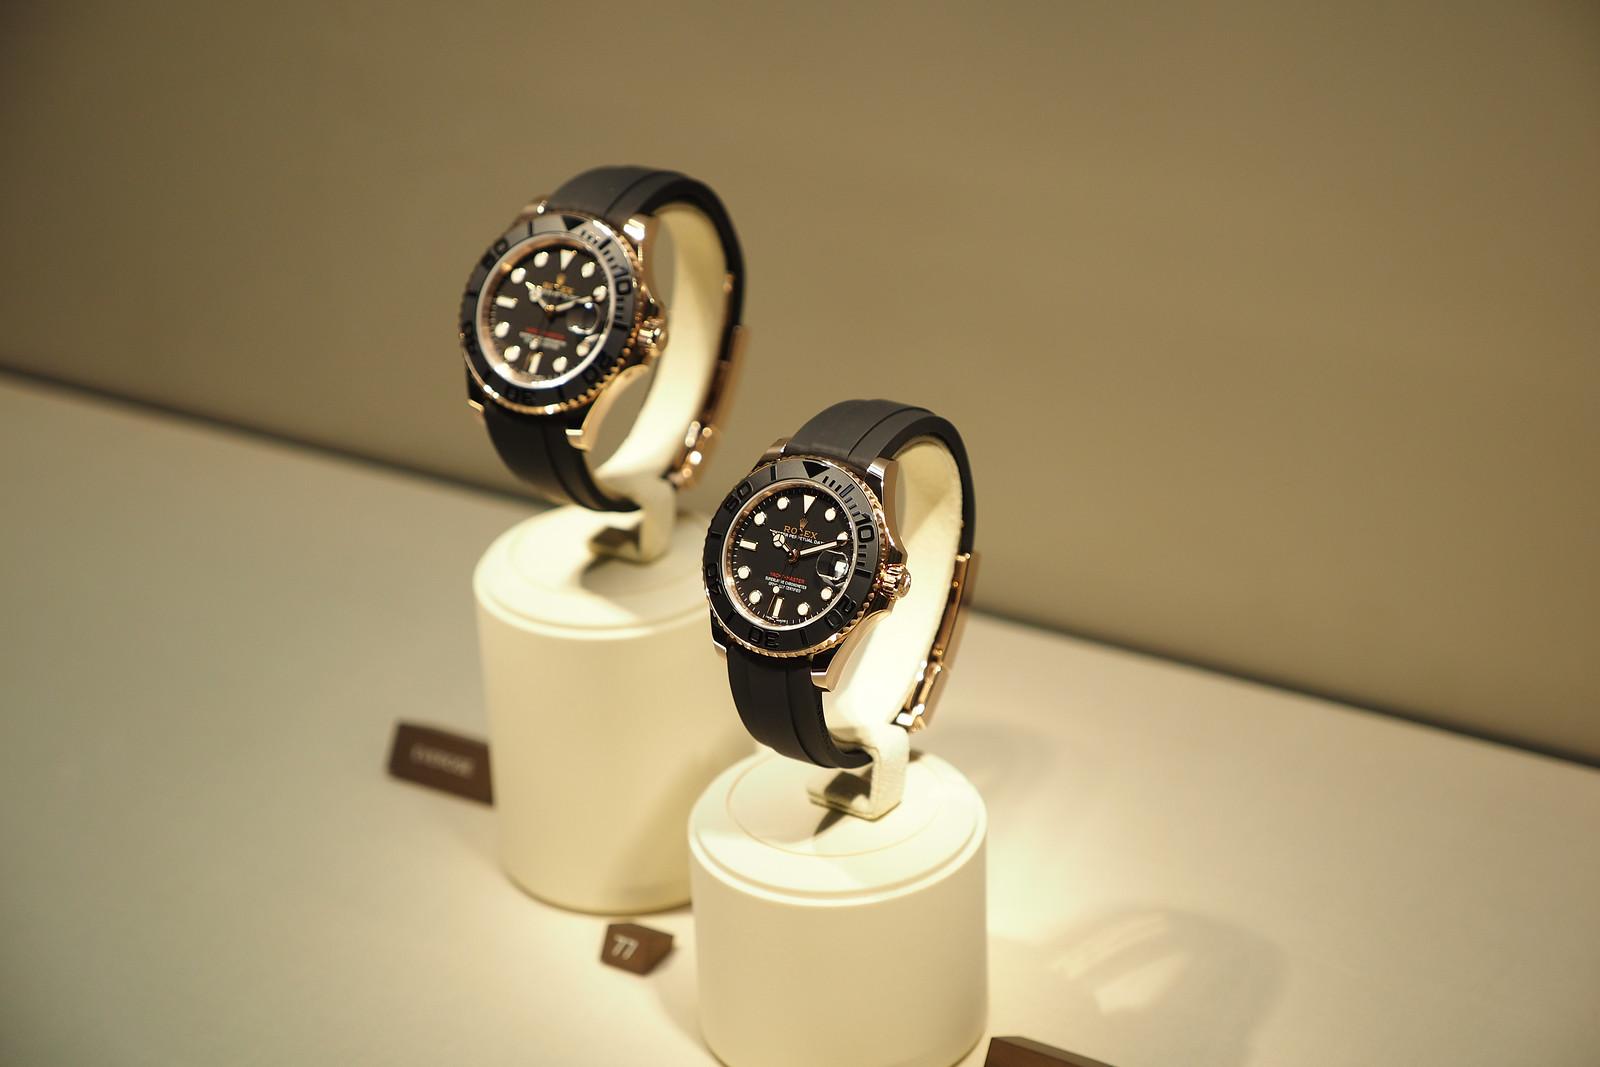 Naziv: Rolex-Everose-Gold-Yachtmaster-Ceramic-Bezel-caseshot.jpg, pregleda: 296, veličina: 199,3 KB